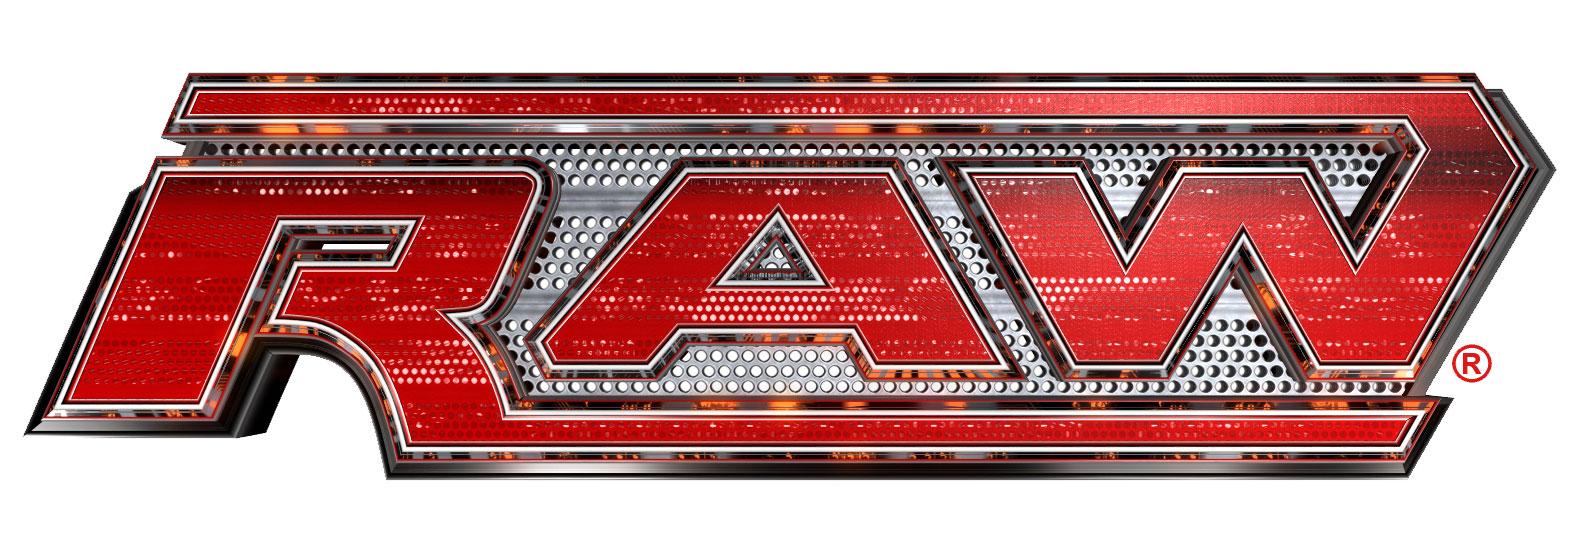 WWE Raw (A partir do show 15/10/12 ) Raw